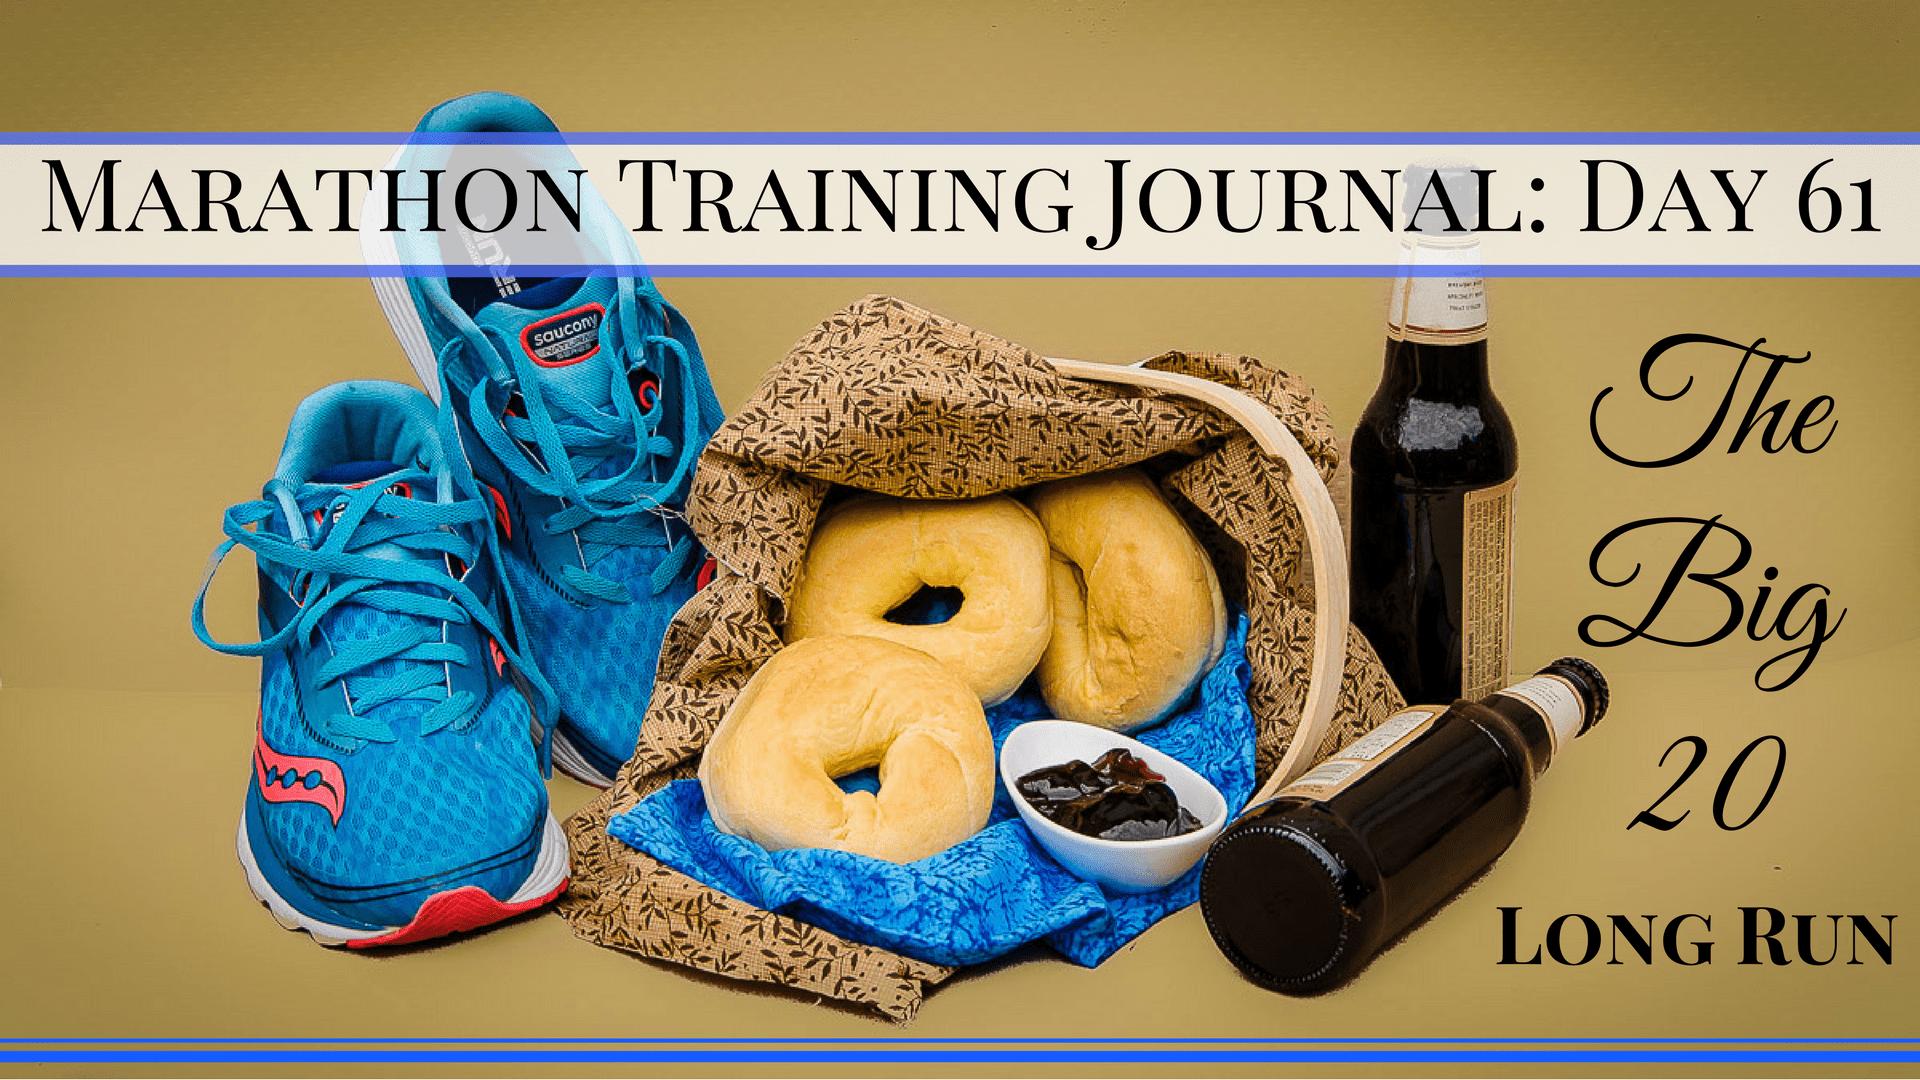 Copy of Marathon Training Journal- Day 61